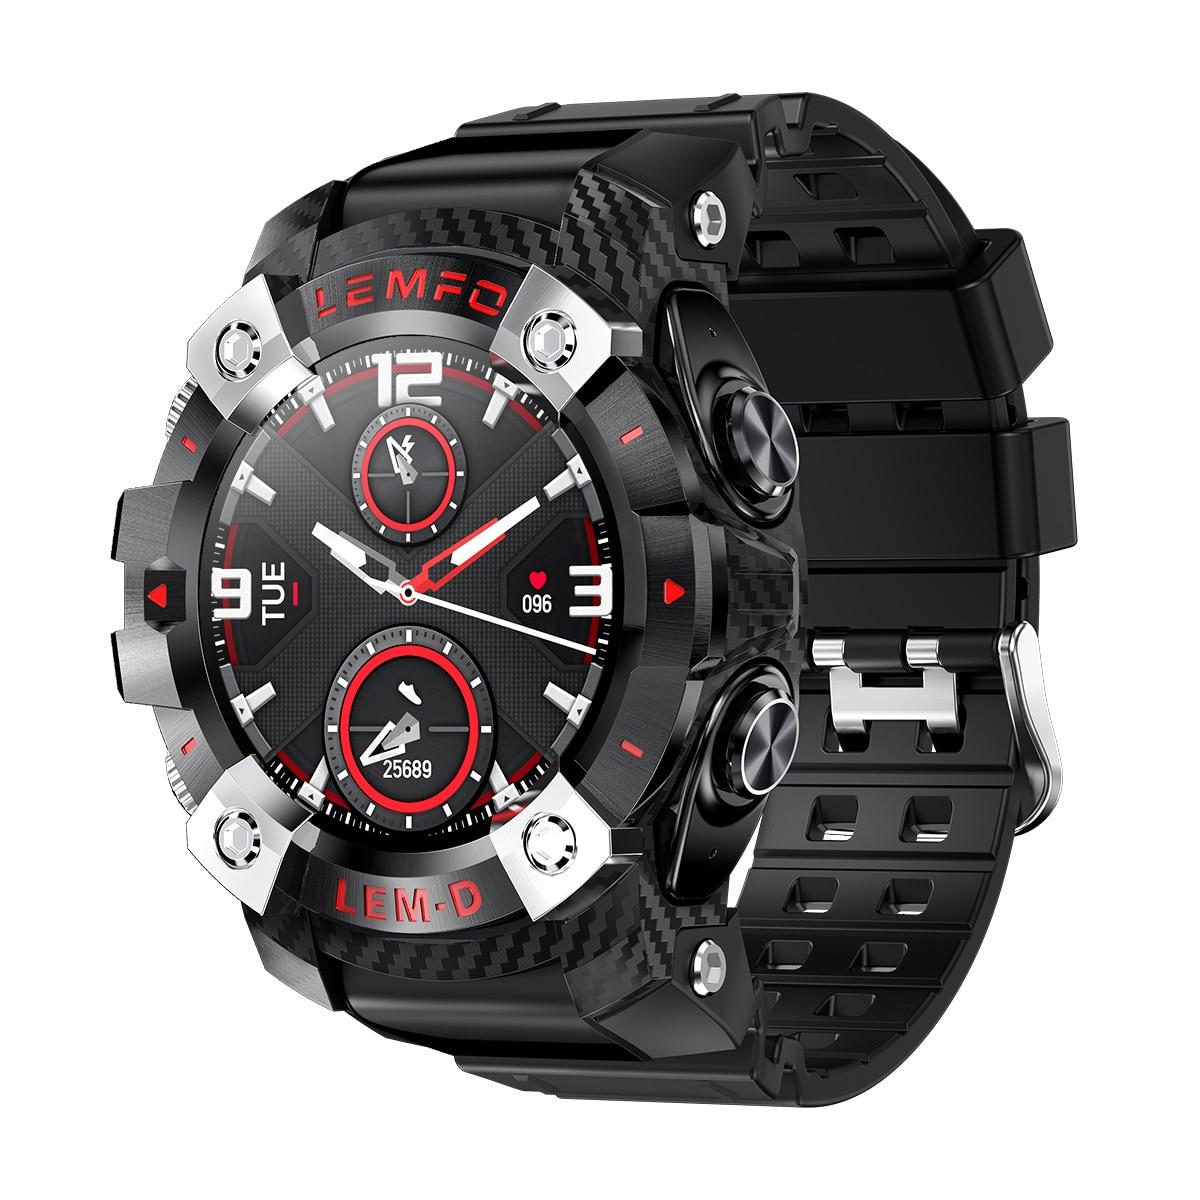 H97ecd9ece5684b1db73bf2fa47fb7cebD LEMFO LEMD Smart Watch Wireless Bluetooth 5.0 Earphone 2 In 1